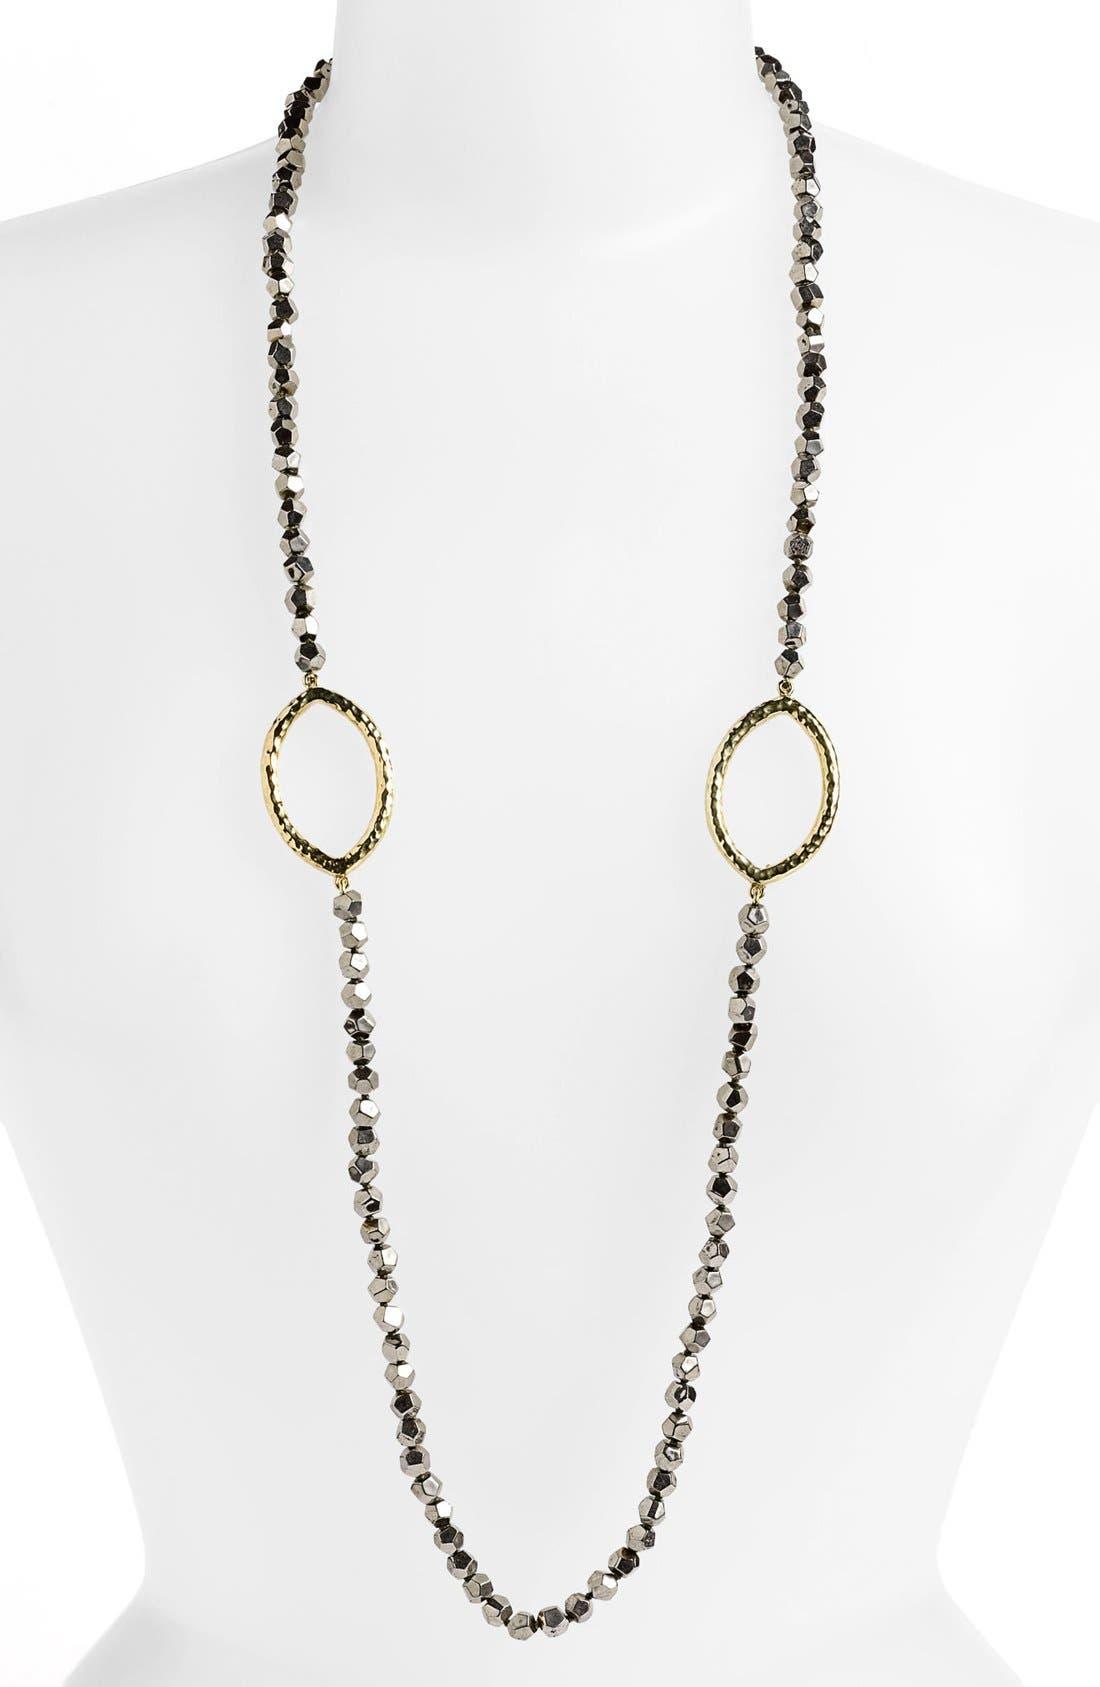 Main Image - Simon Sebbag Long Faceted Stone Necklace